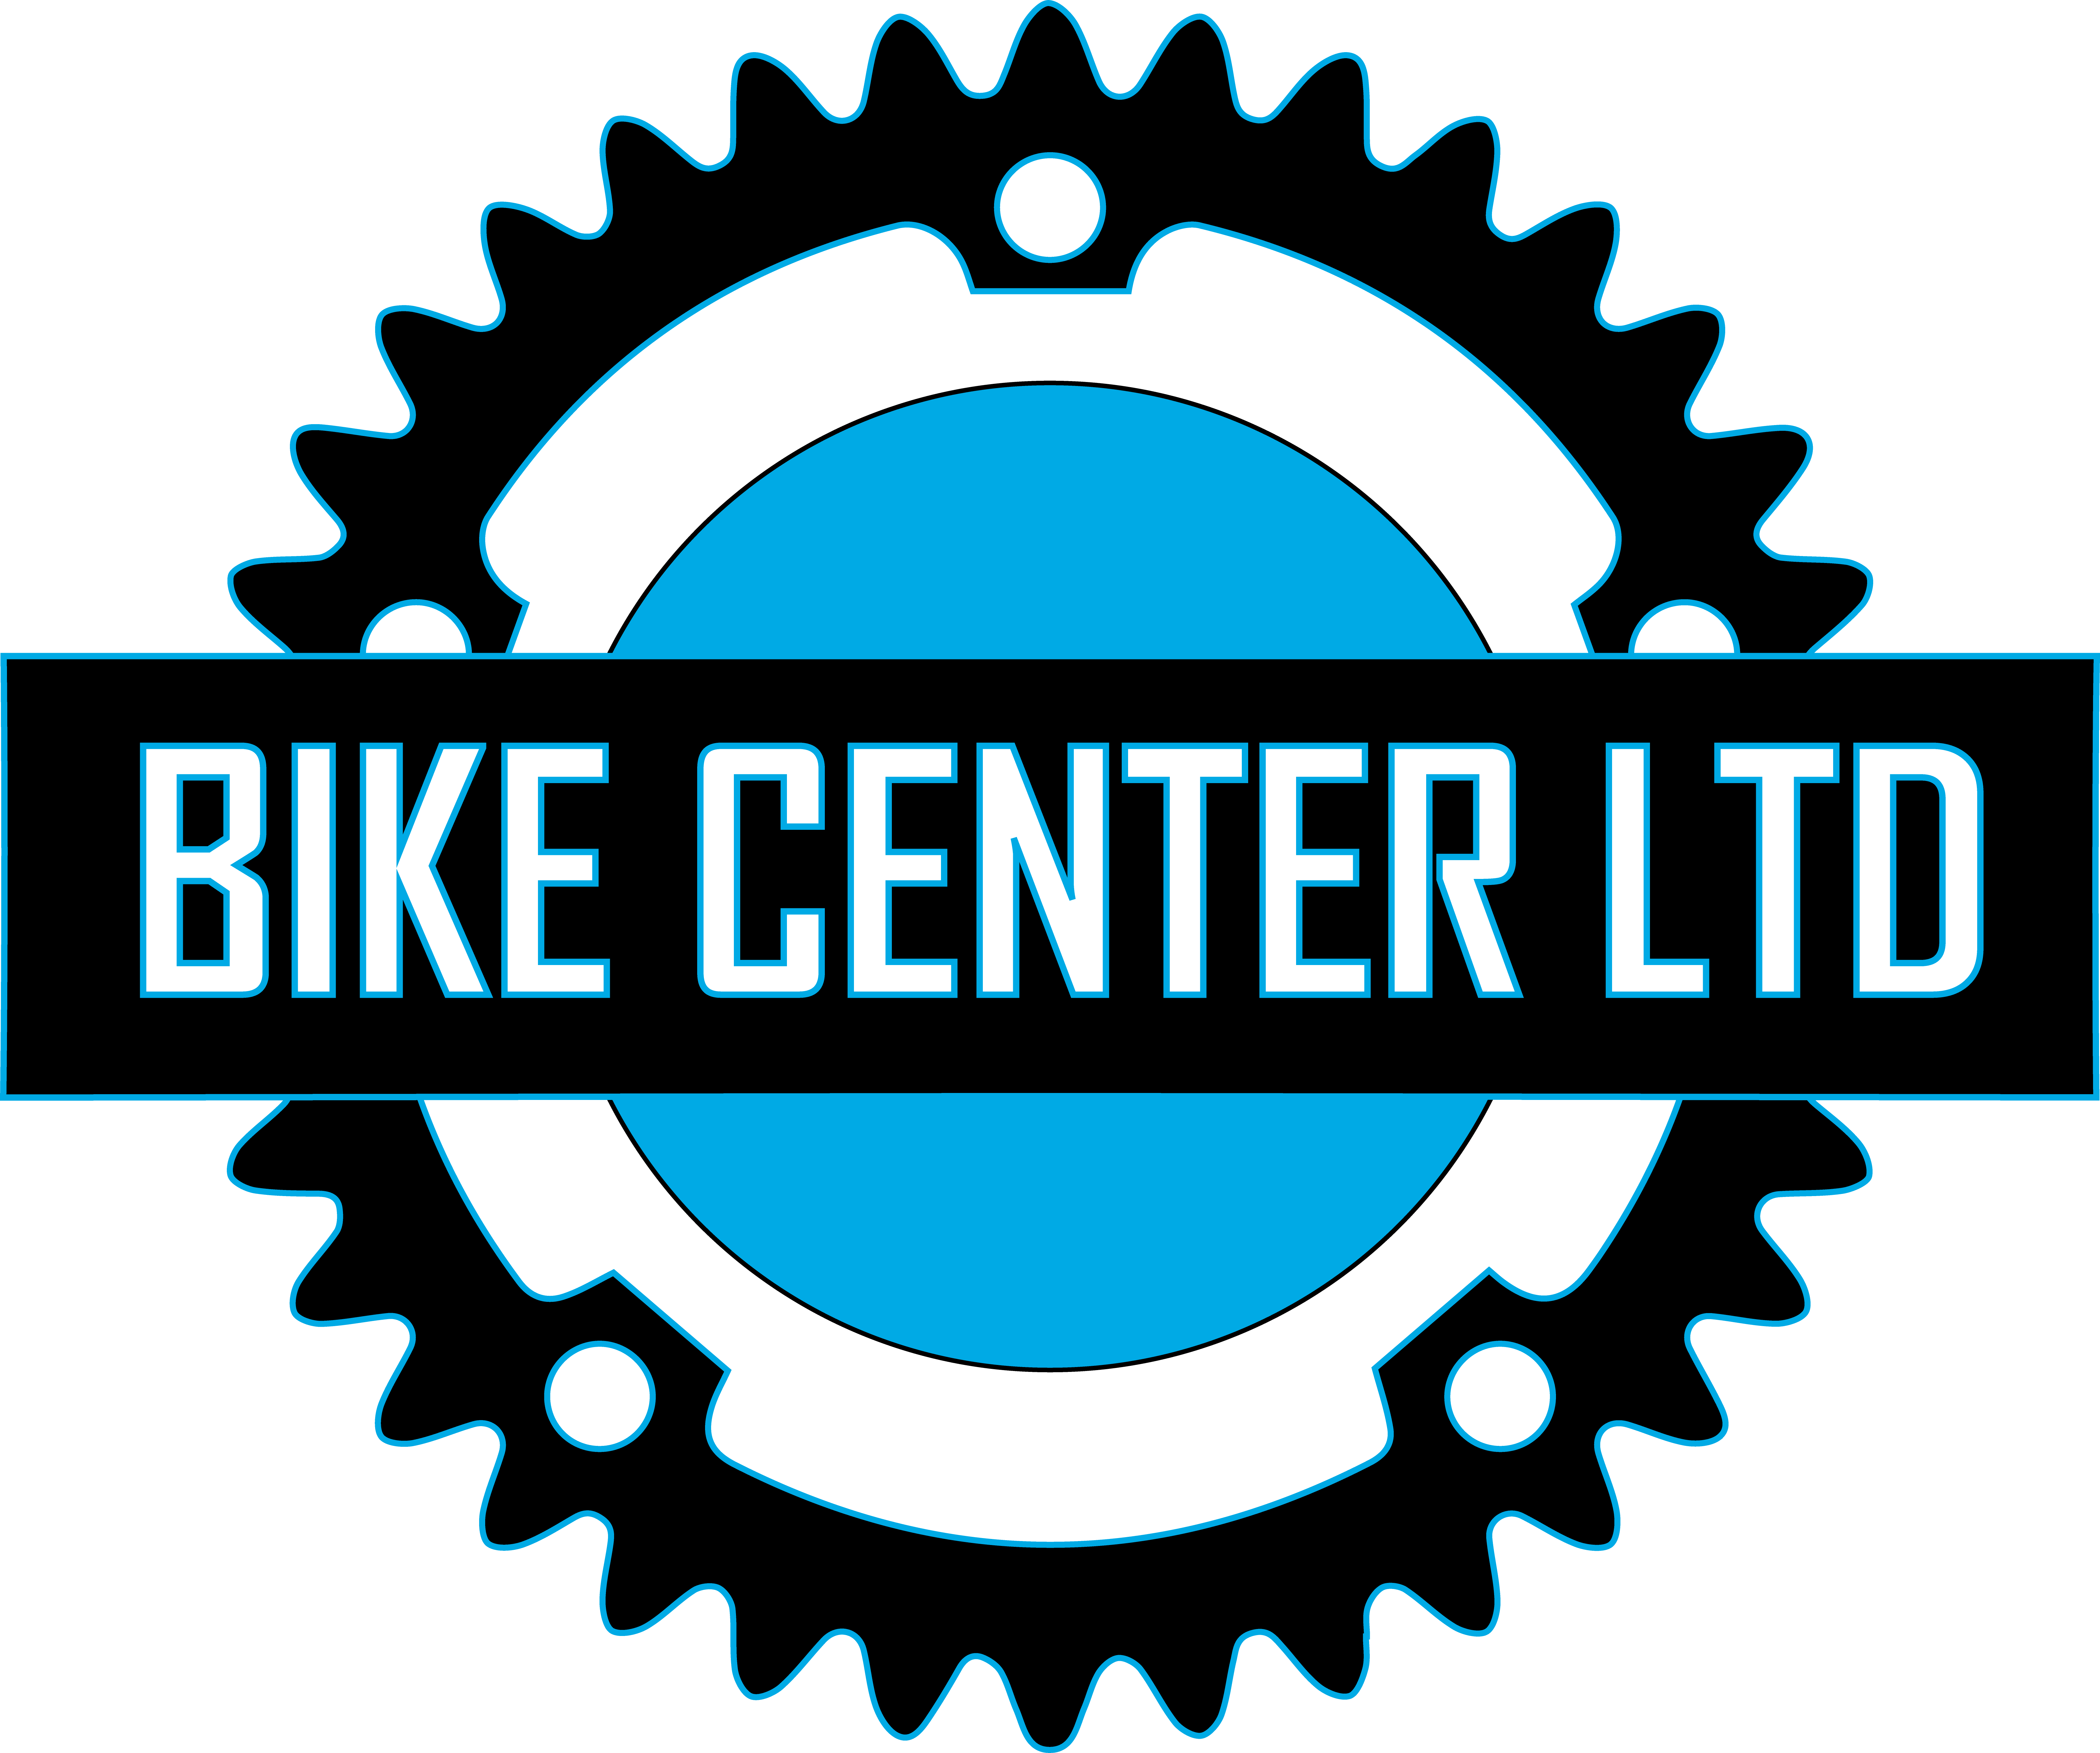 Bike Center Ltd Home Page